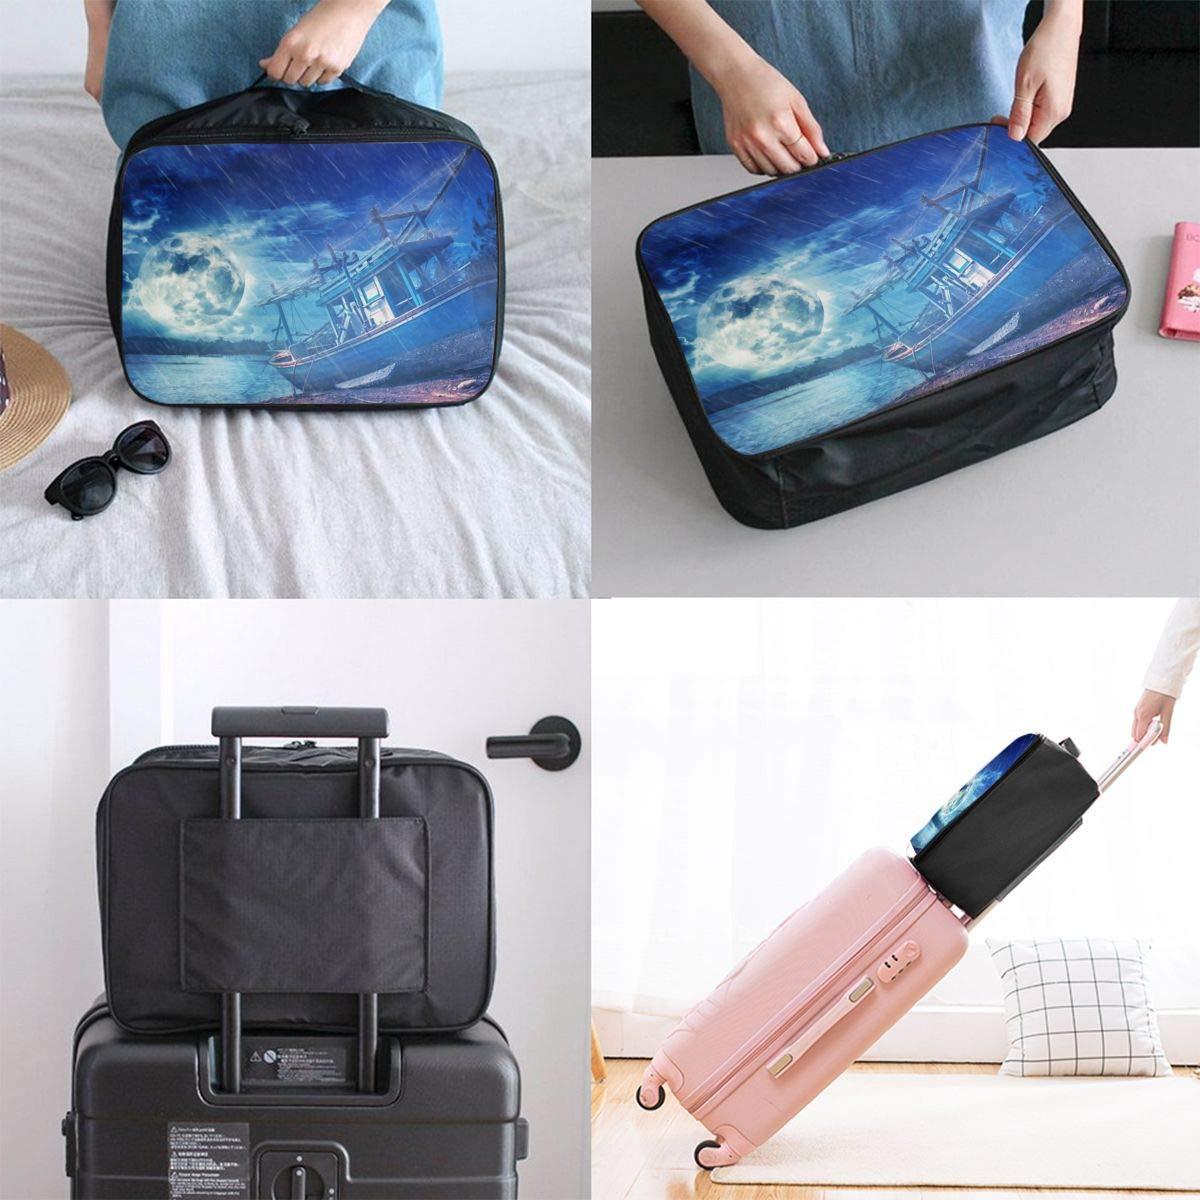 Travel Luggage Duffle Bag Lightweight Portable Handbag Fantasy Stormy Ocean Large Capacity Waterproof Foldable Storage Tote